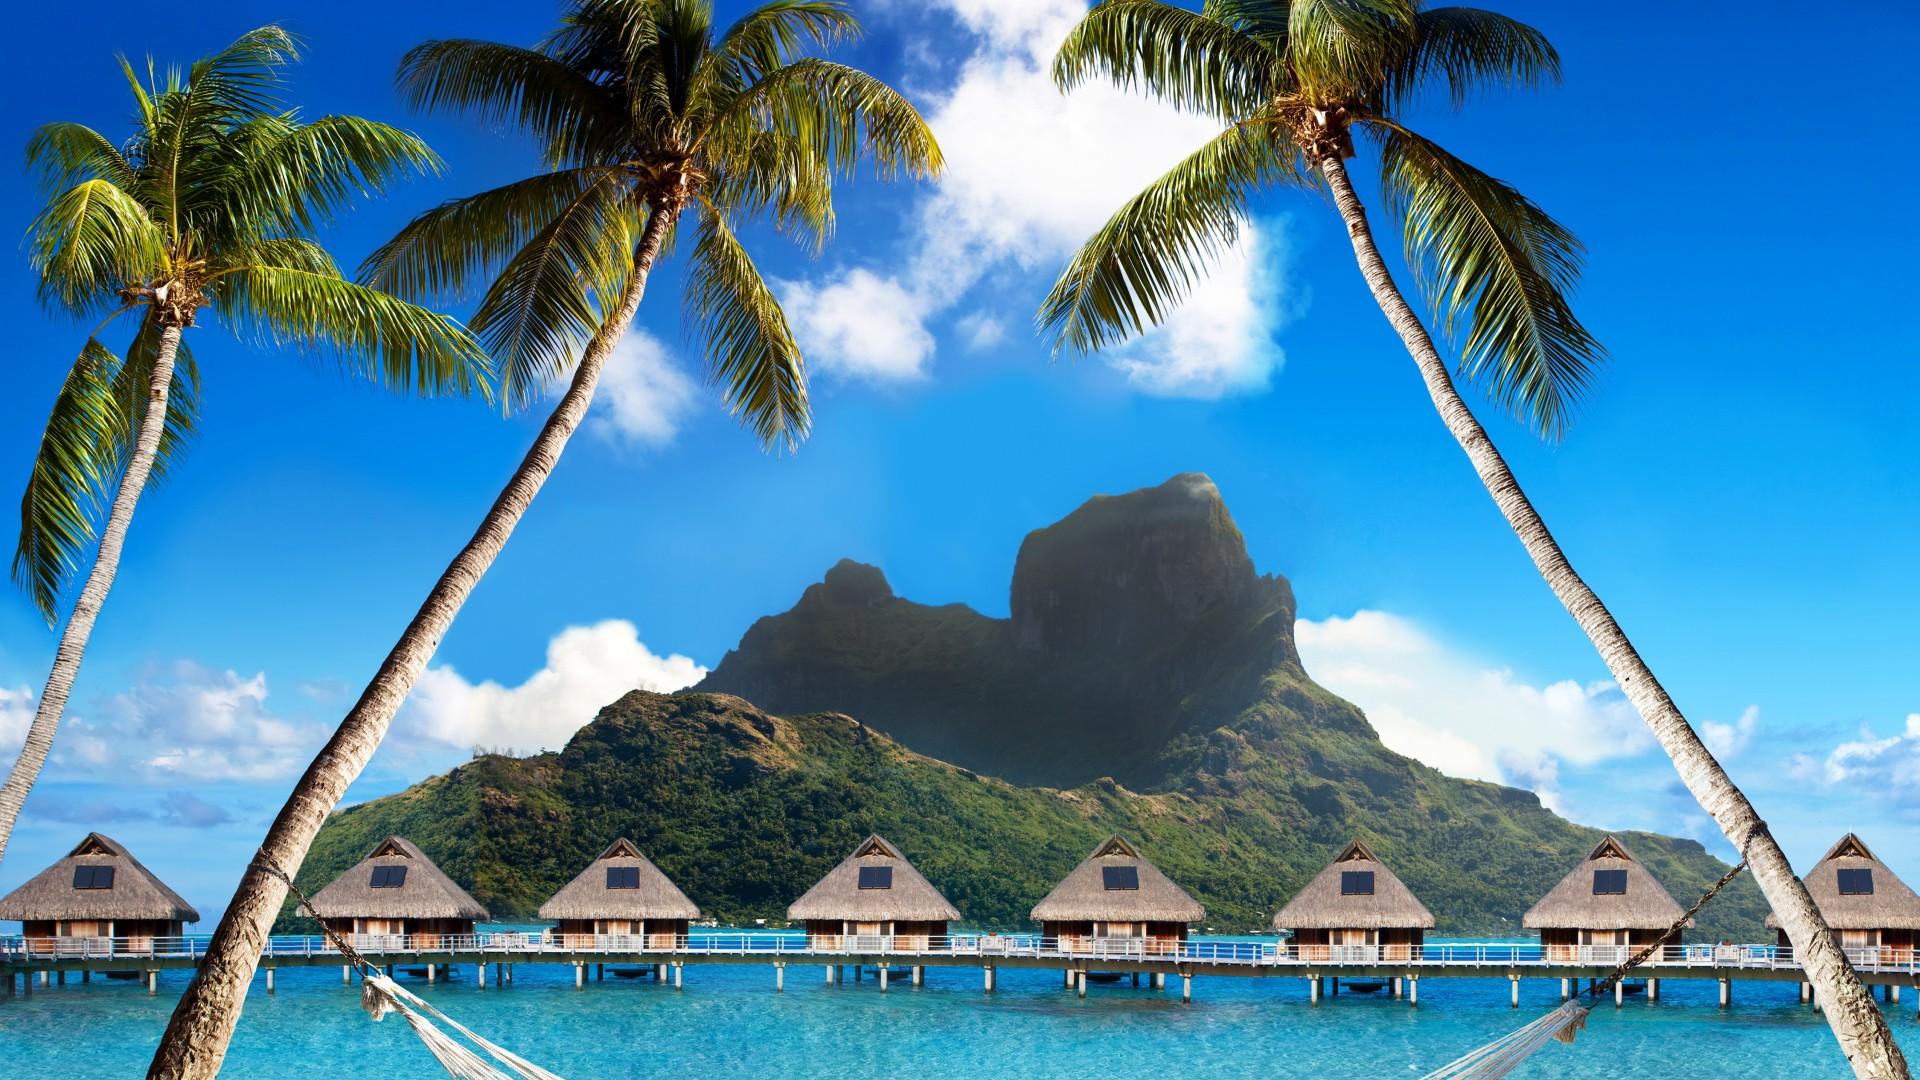 Wallpaper Bora Bora 5k 4k wallpaper French Polynesia